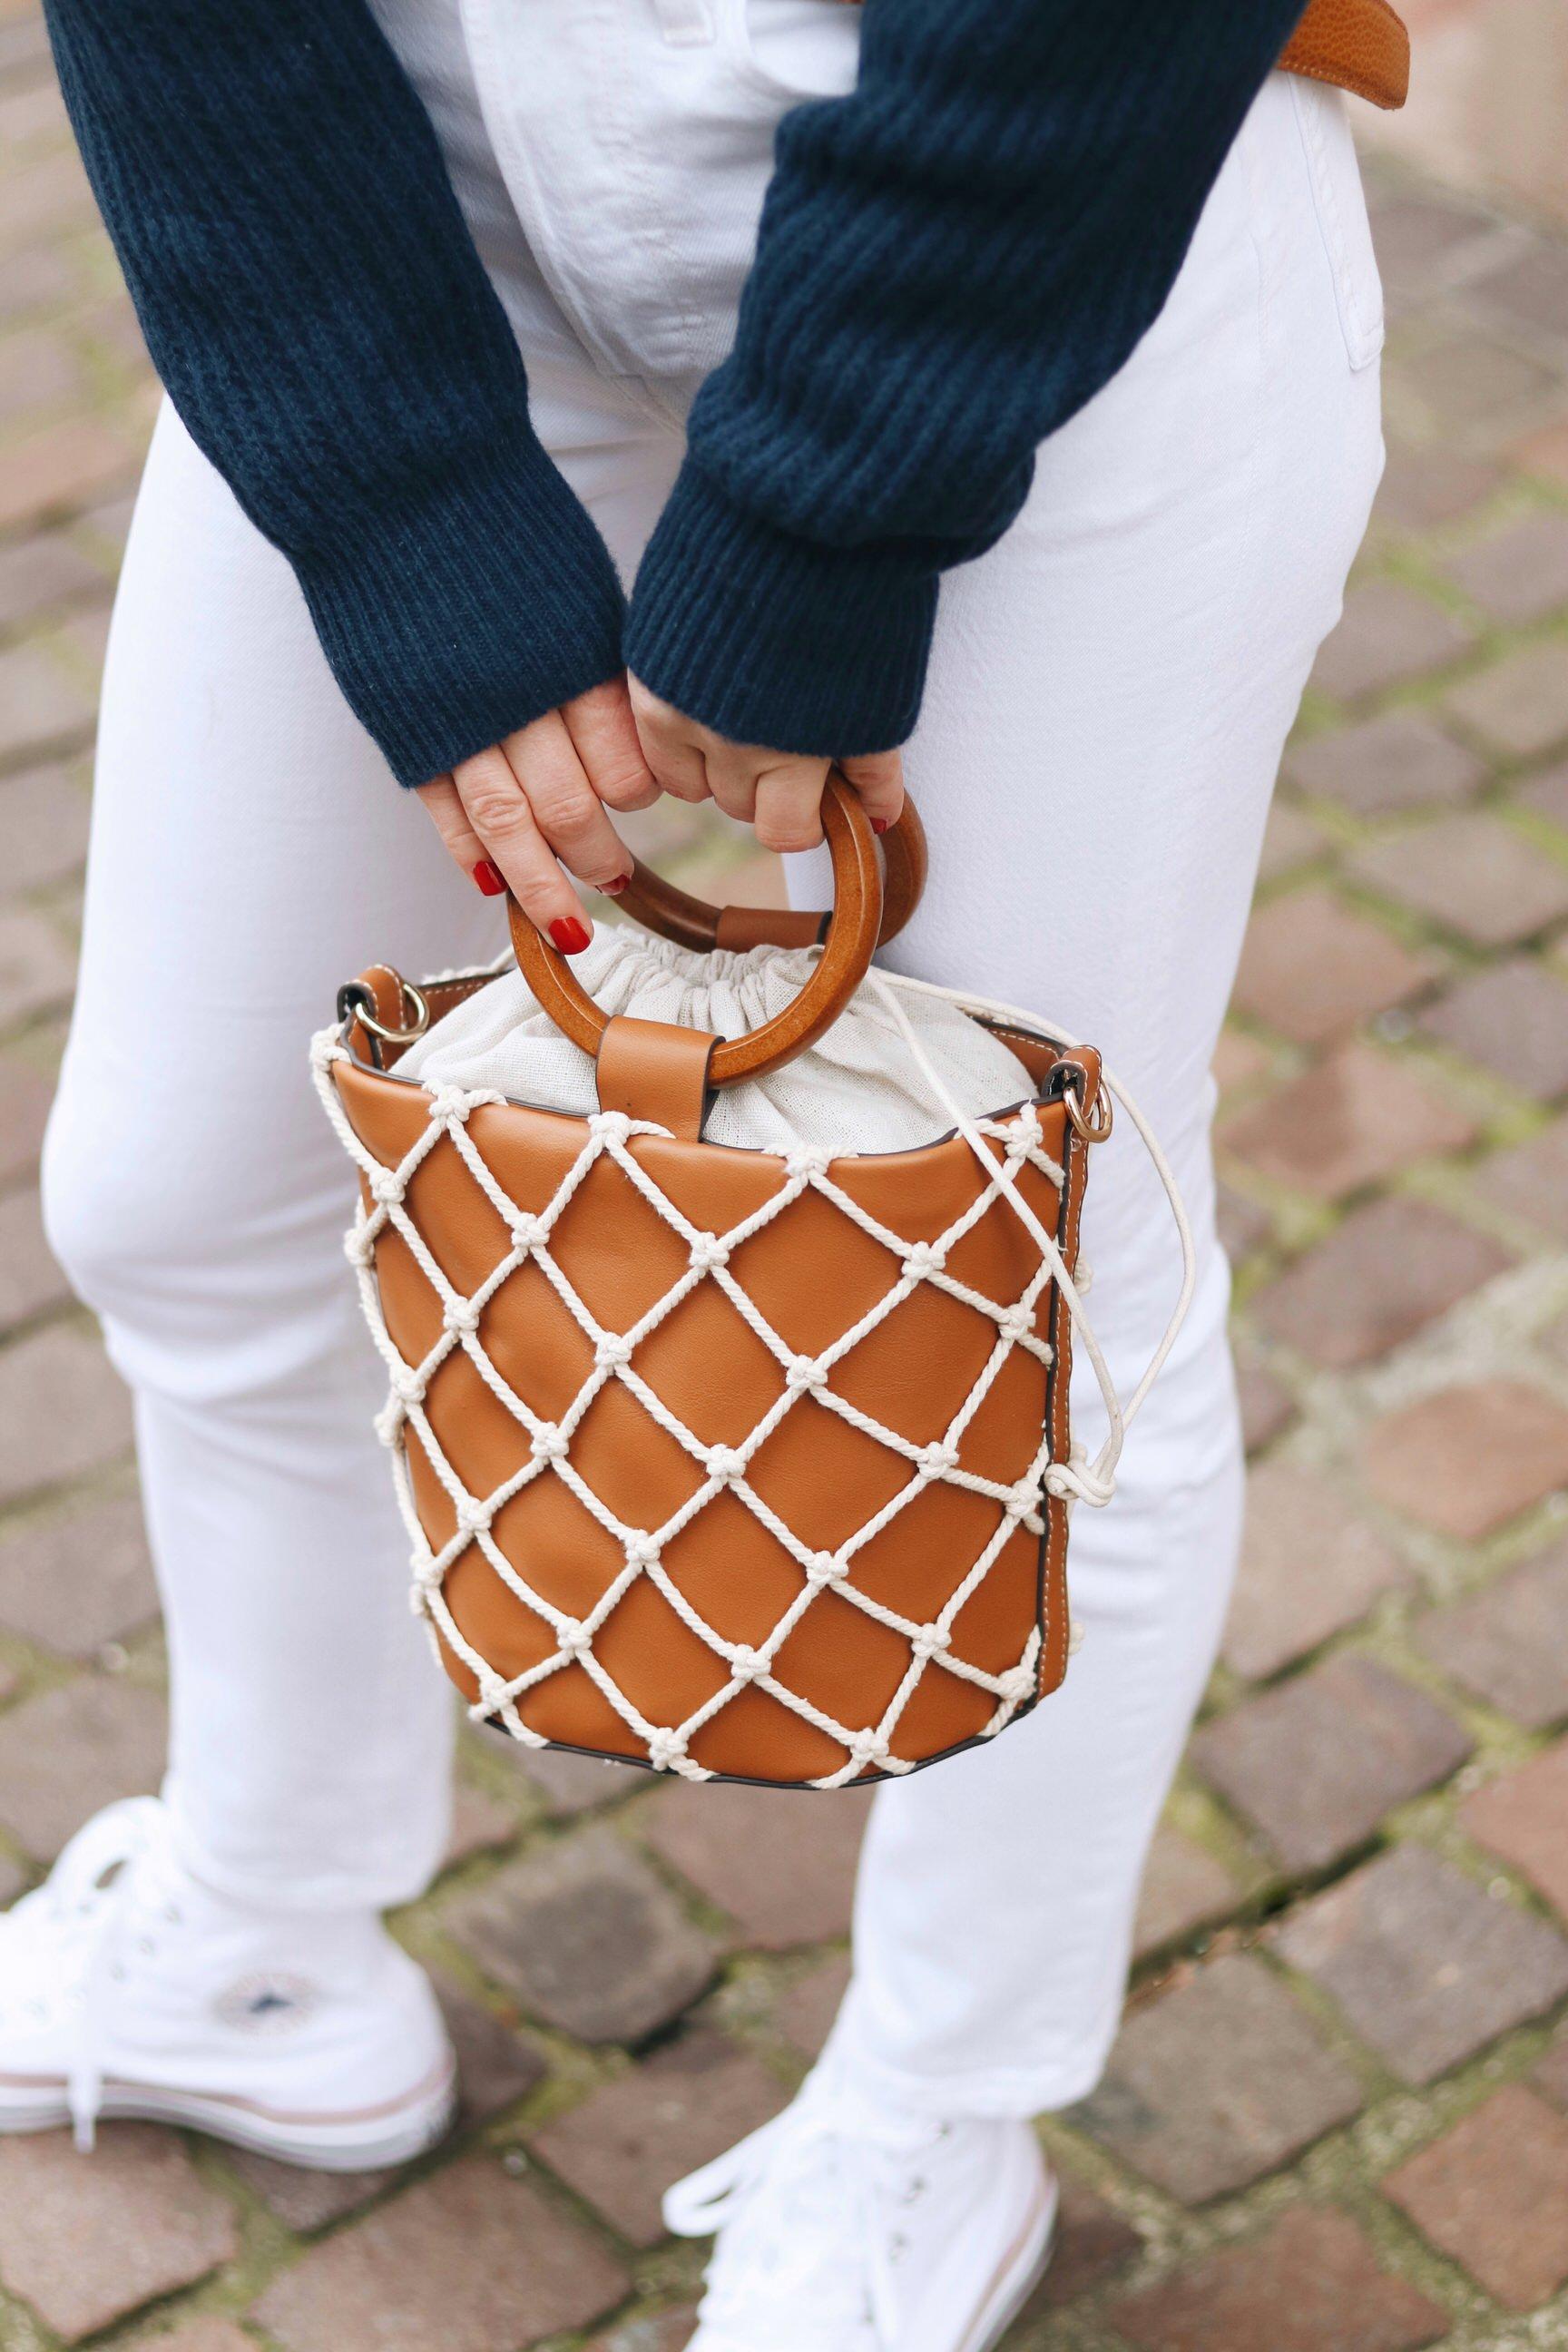 Ring Tasche Bag Mango kombinieren Modeblog Outfit Streetstyle Mom JEans weiss Blog Winterlook Neele